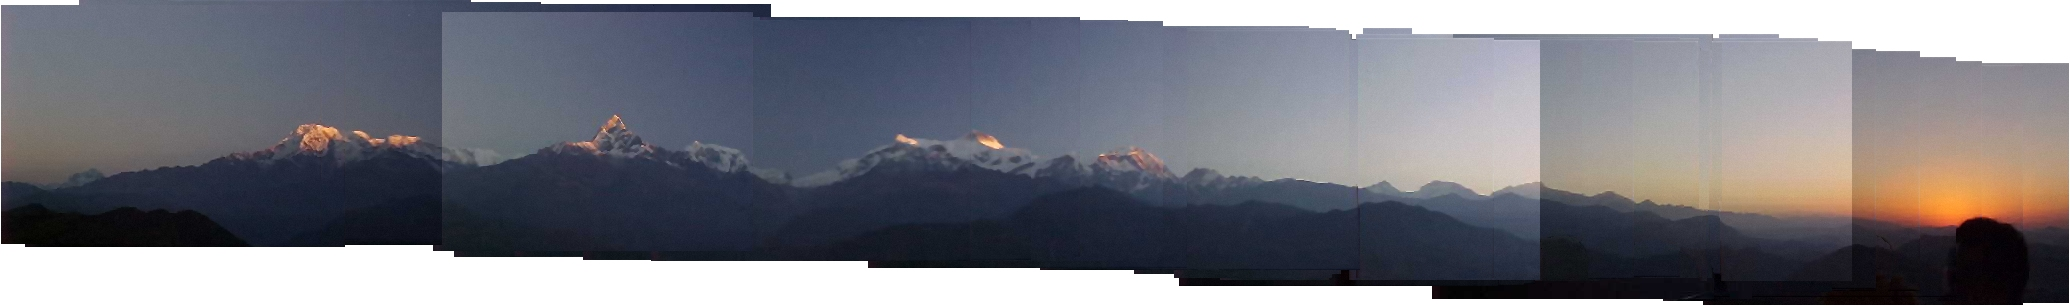 Panorama of the annapurna range from the top of Sarangkot